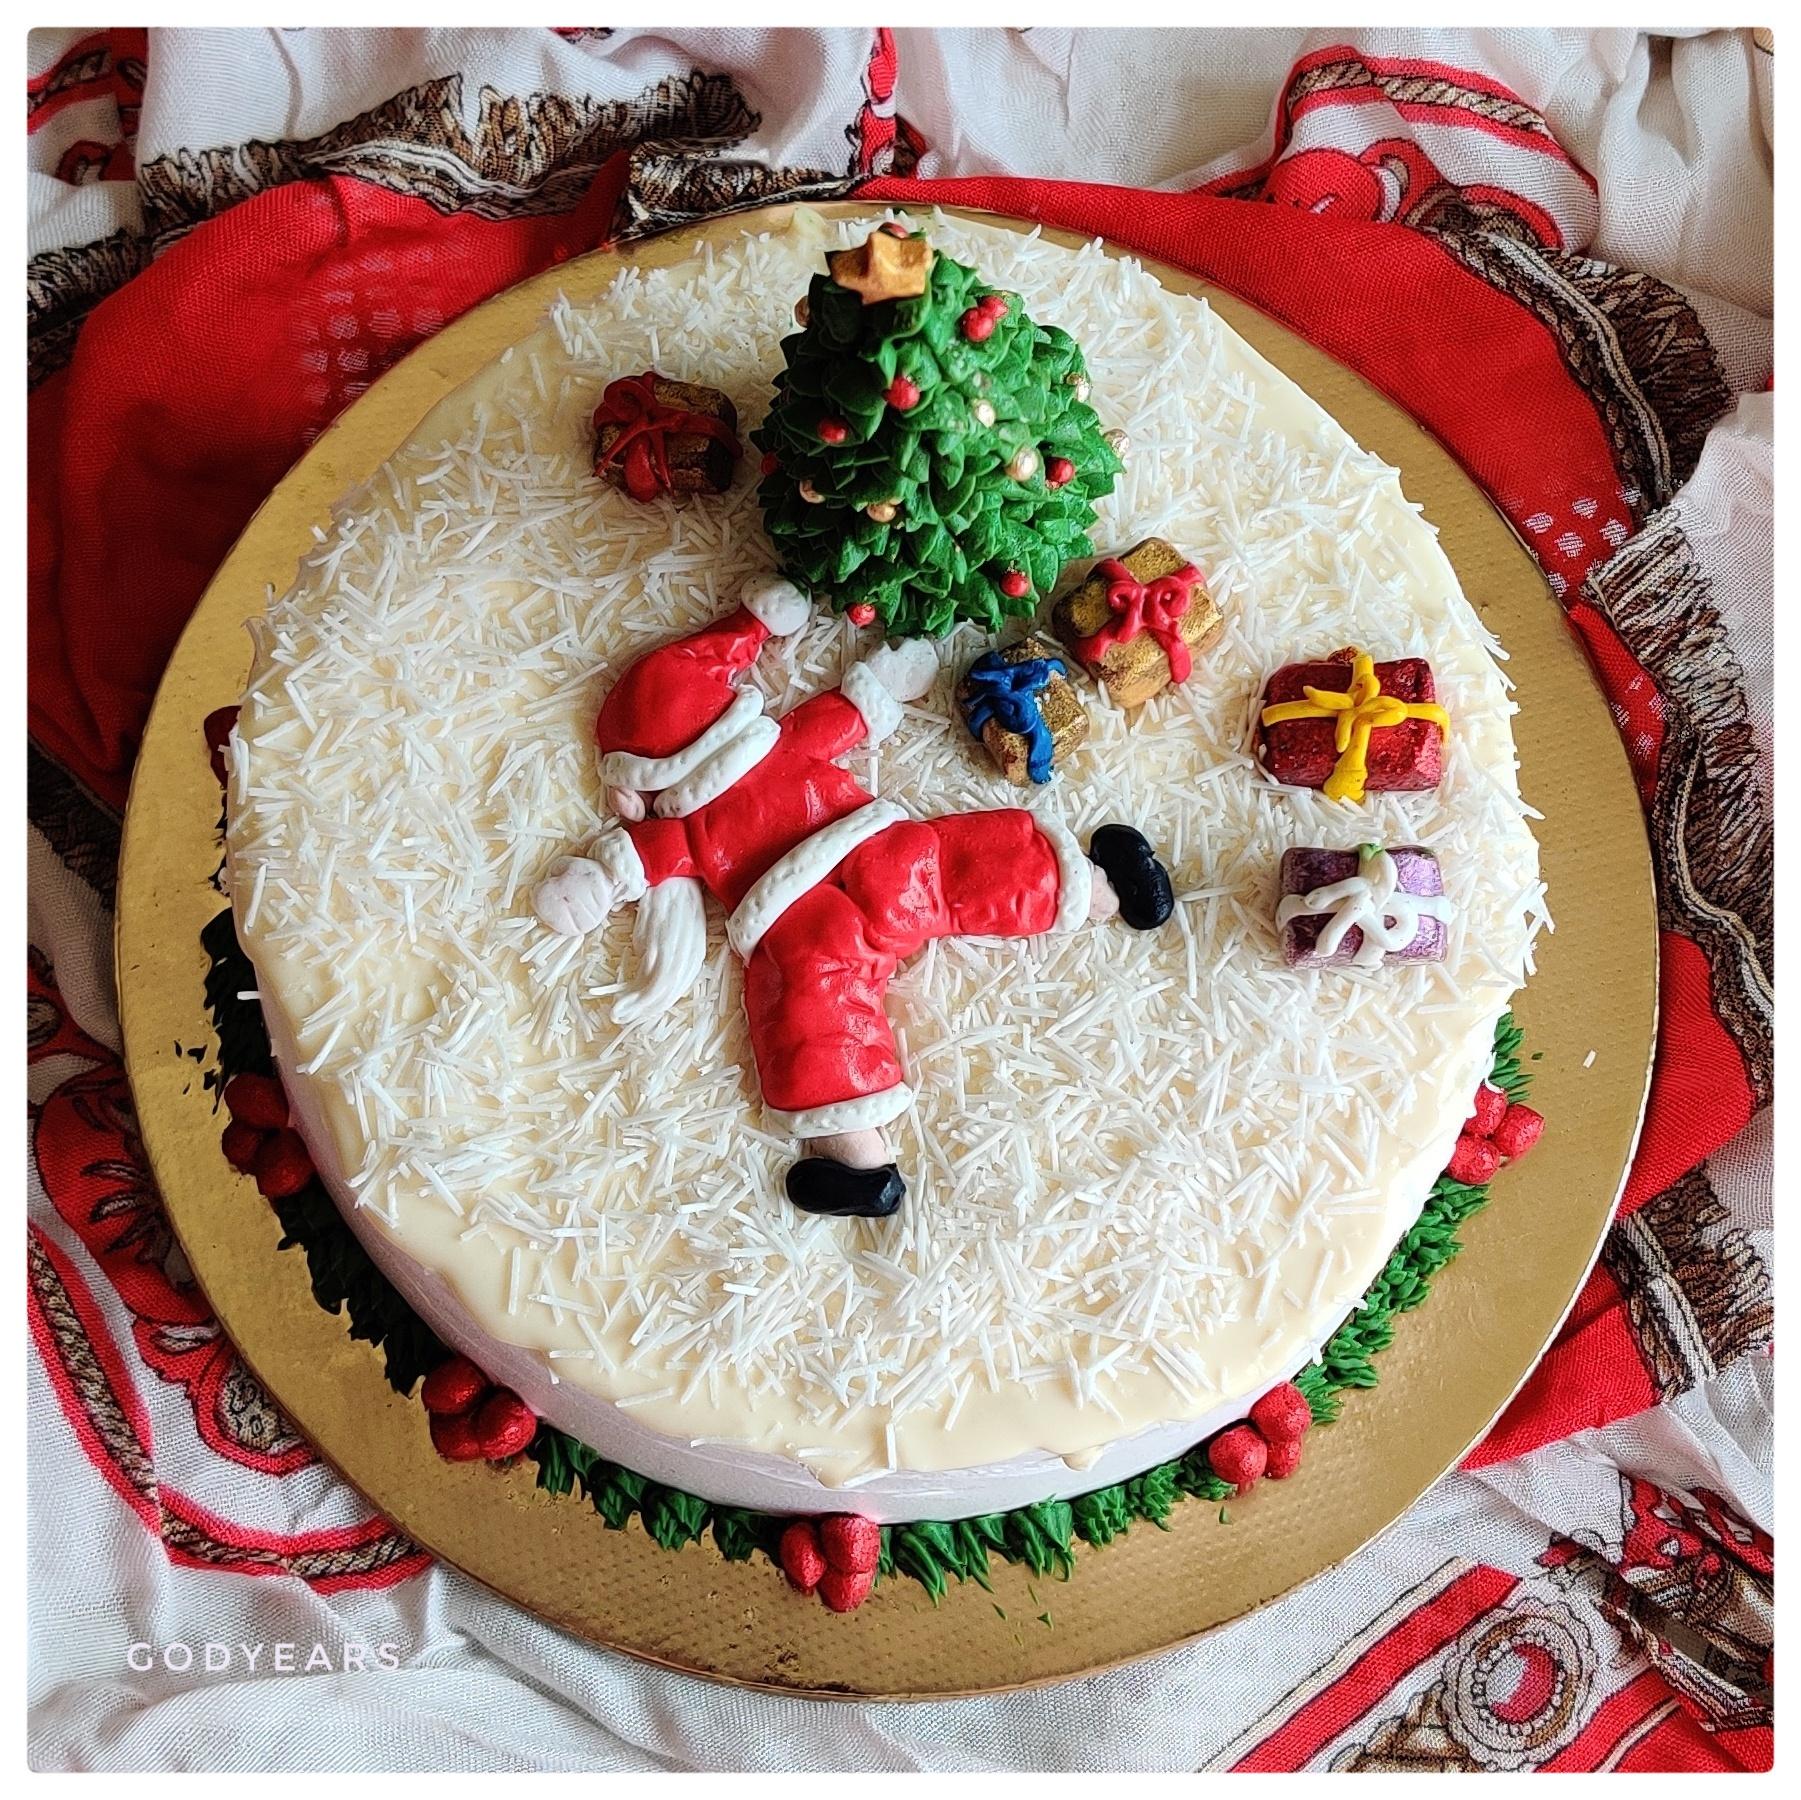 Funny homemade Christmas cake